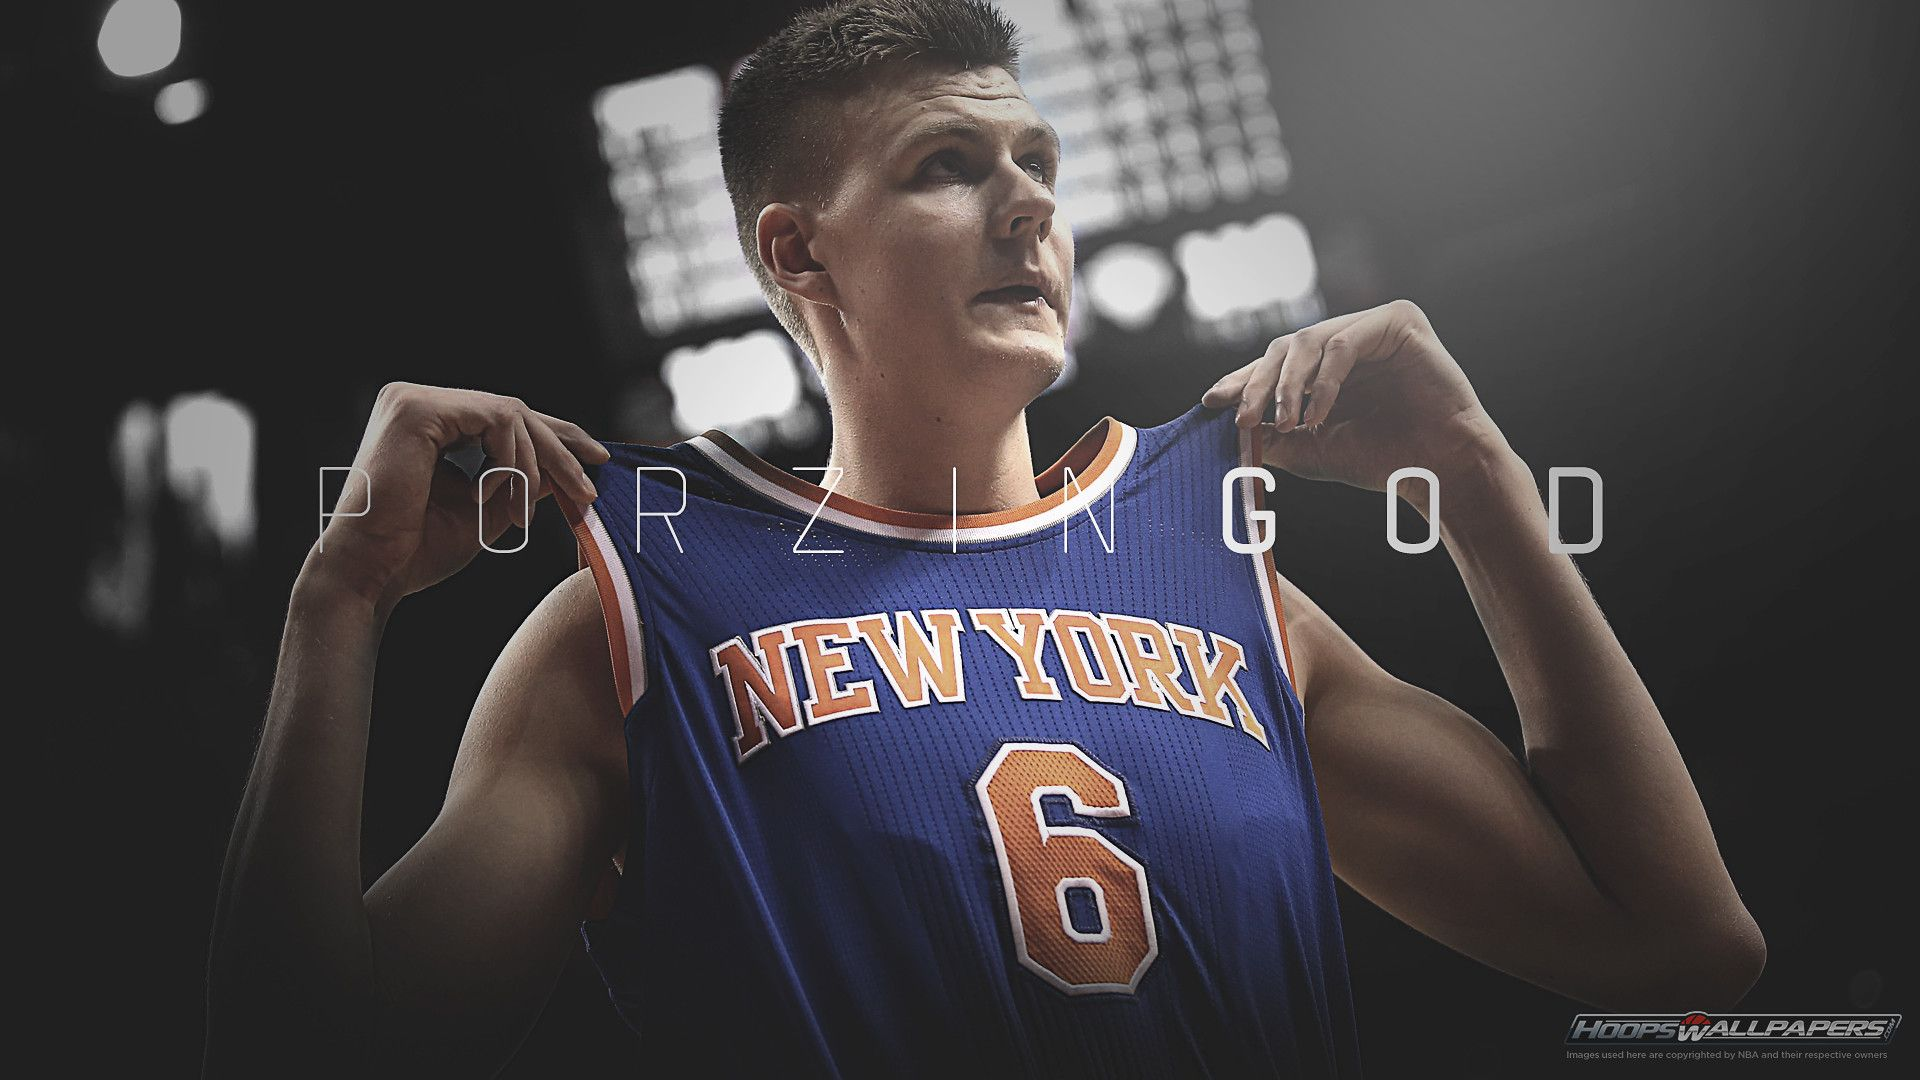 e1cdaae40 1920x1080 Kristaps Porzingis Knicks Wallpaper. Free NBA wallpapers at  HoopsWallpapers.com  Newest NBA and basketball .